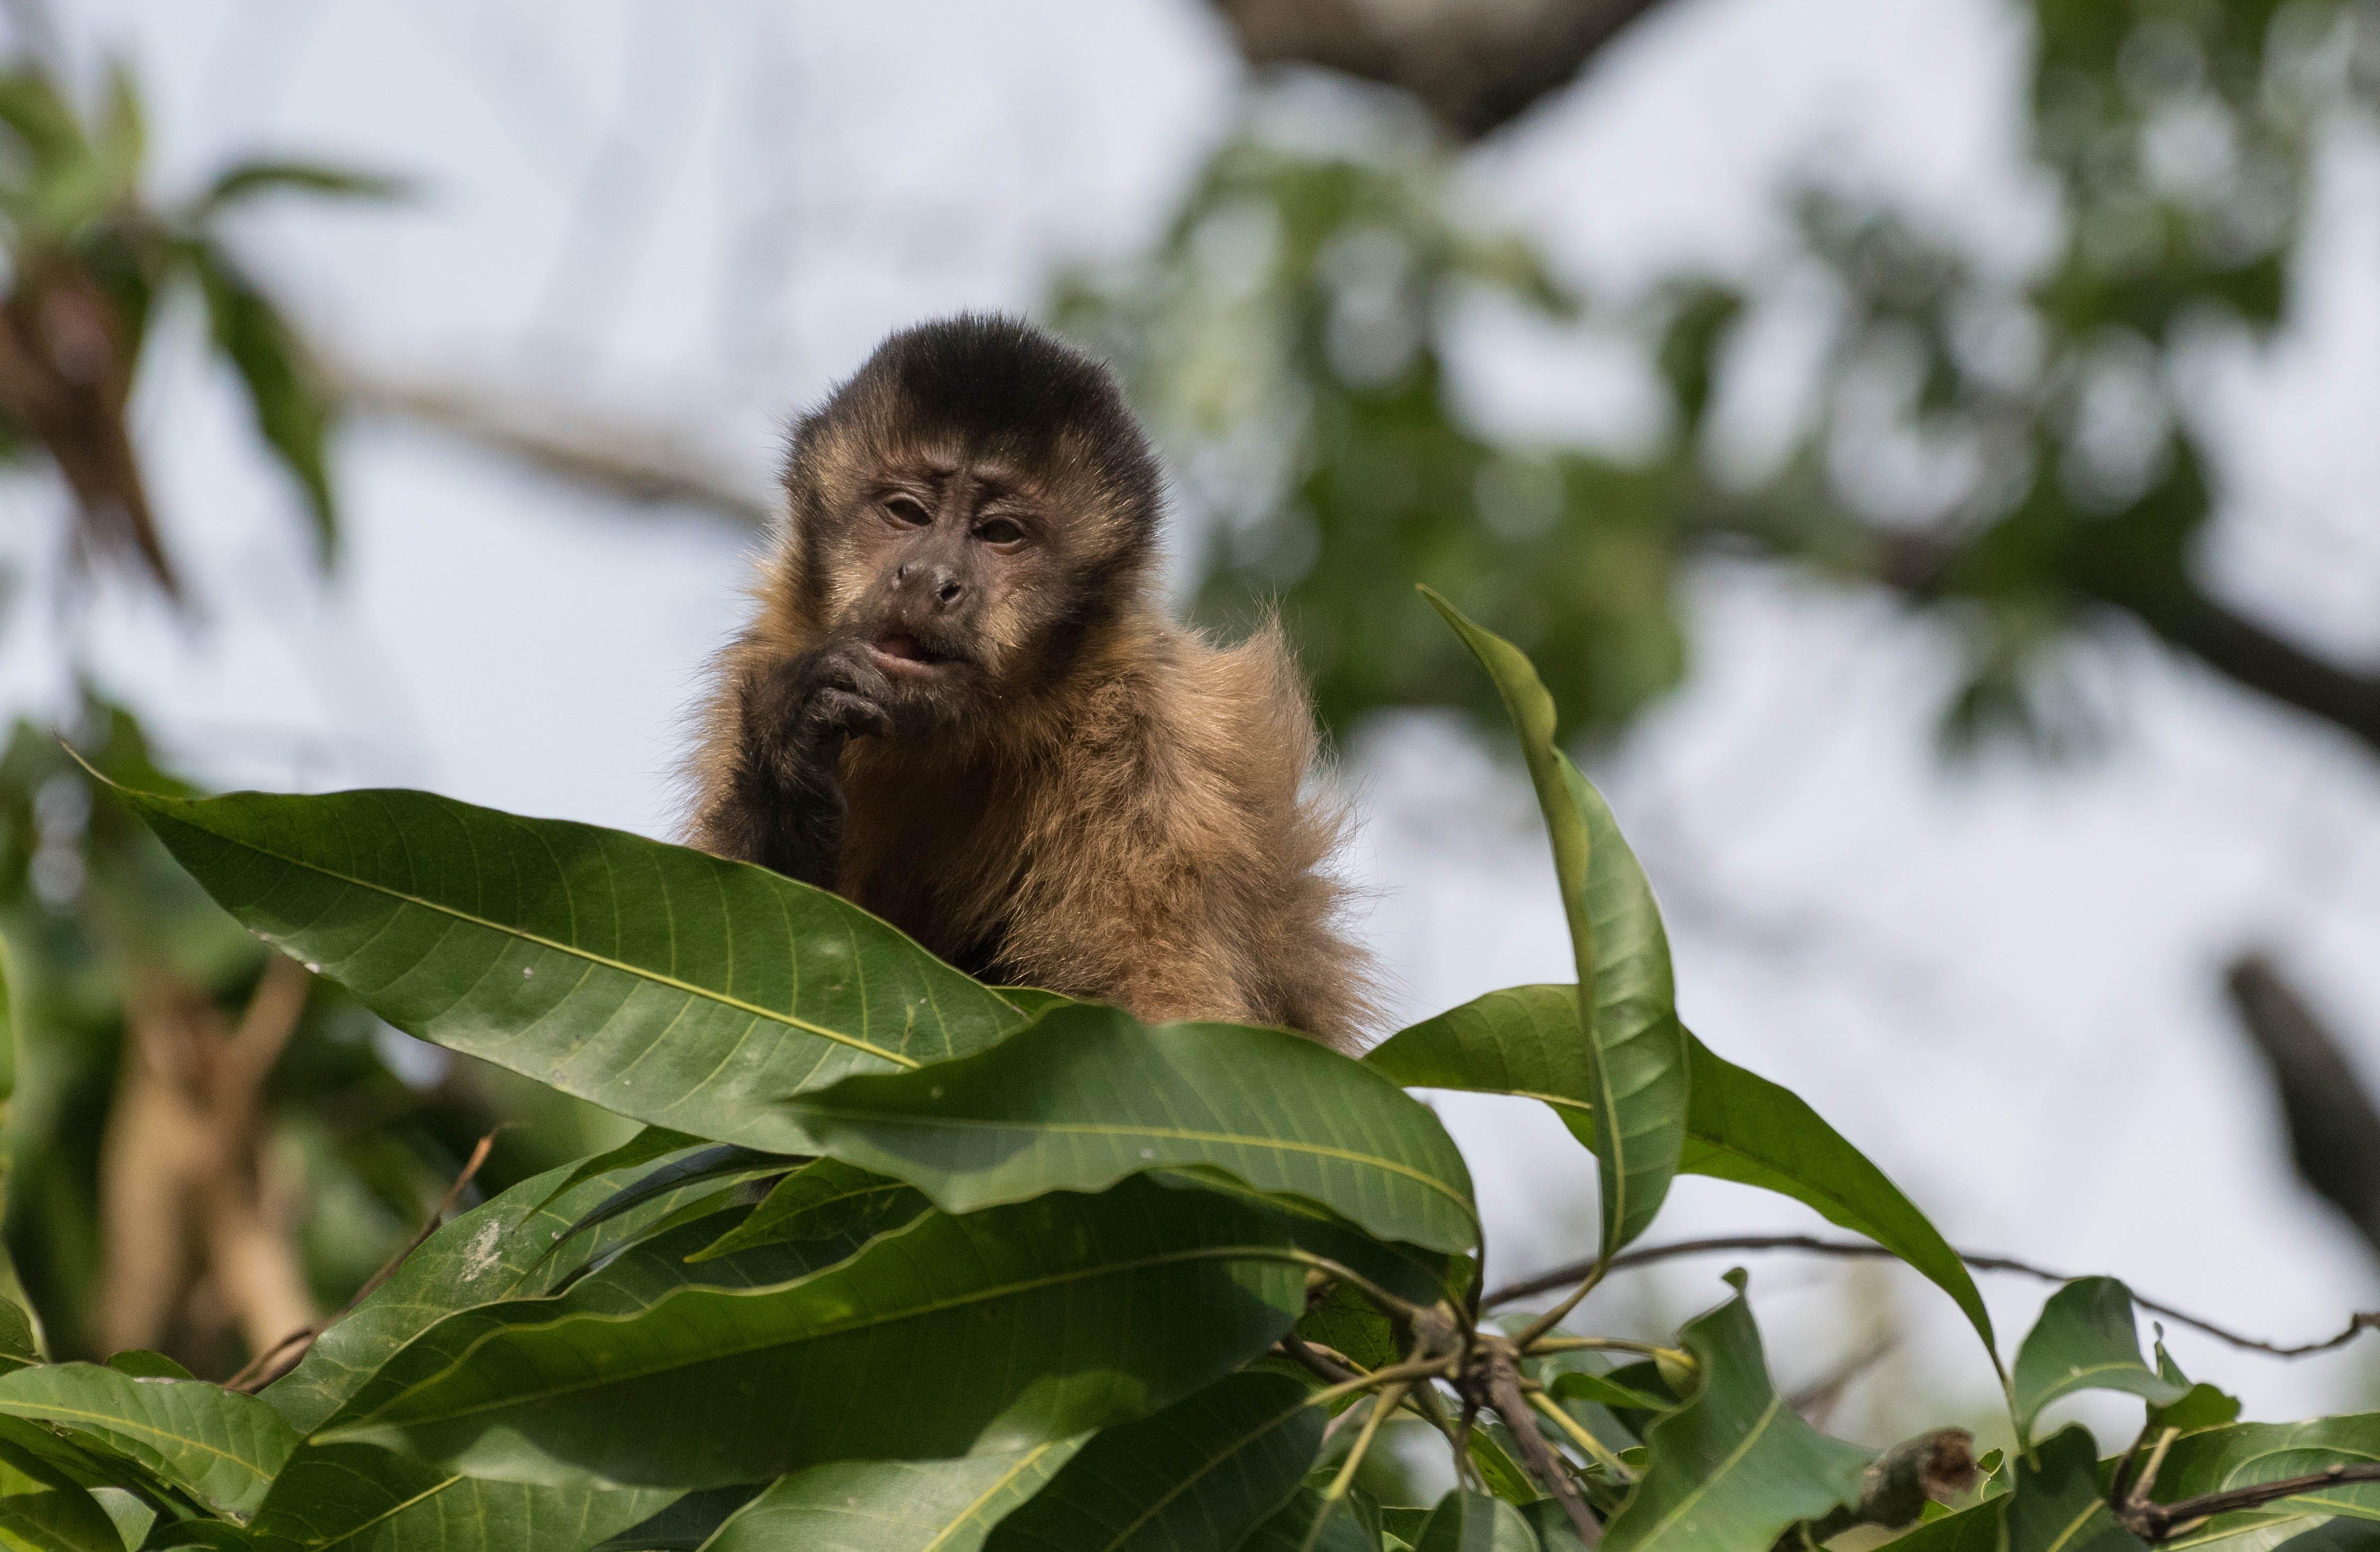 Free stock photo of macaco, monkey, Pensando, pensativo